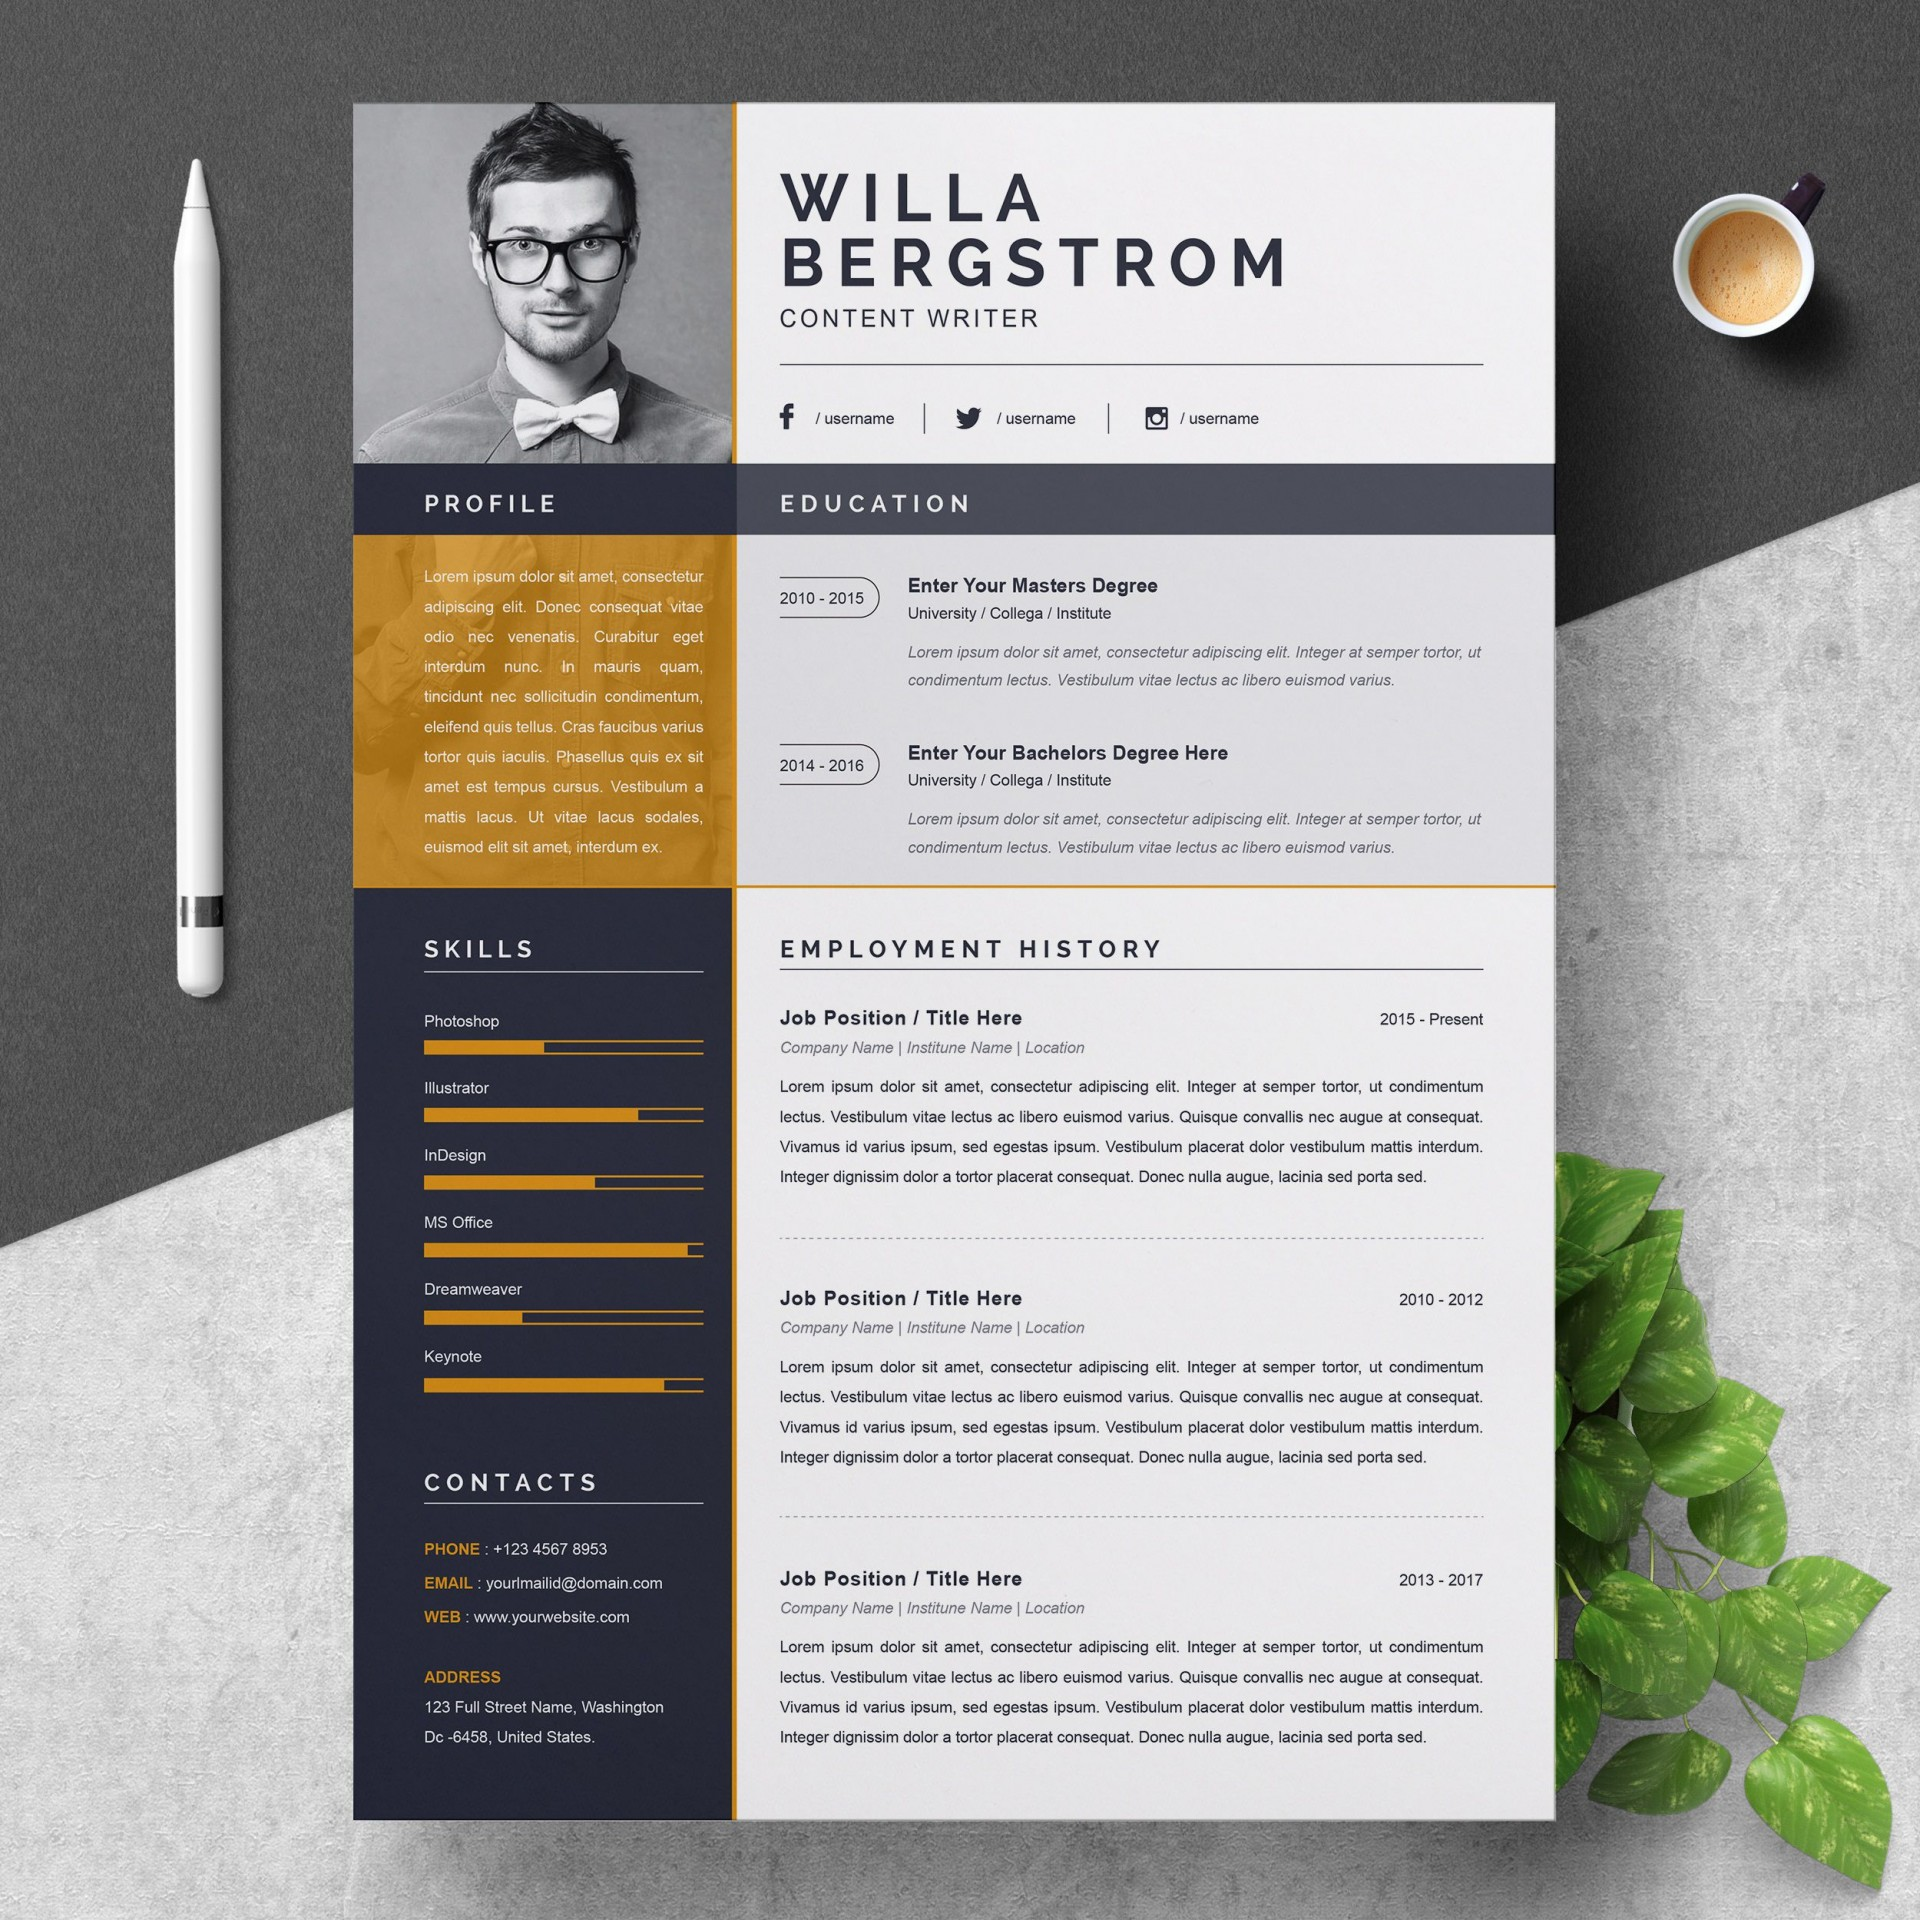 000 Stirring Resume Template Word 2016 Design  Cv Professional1920